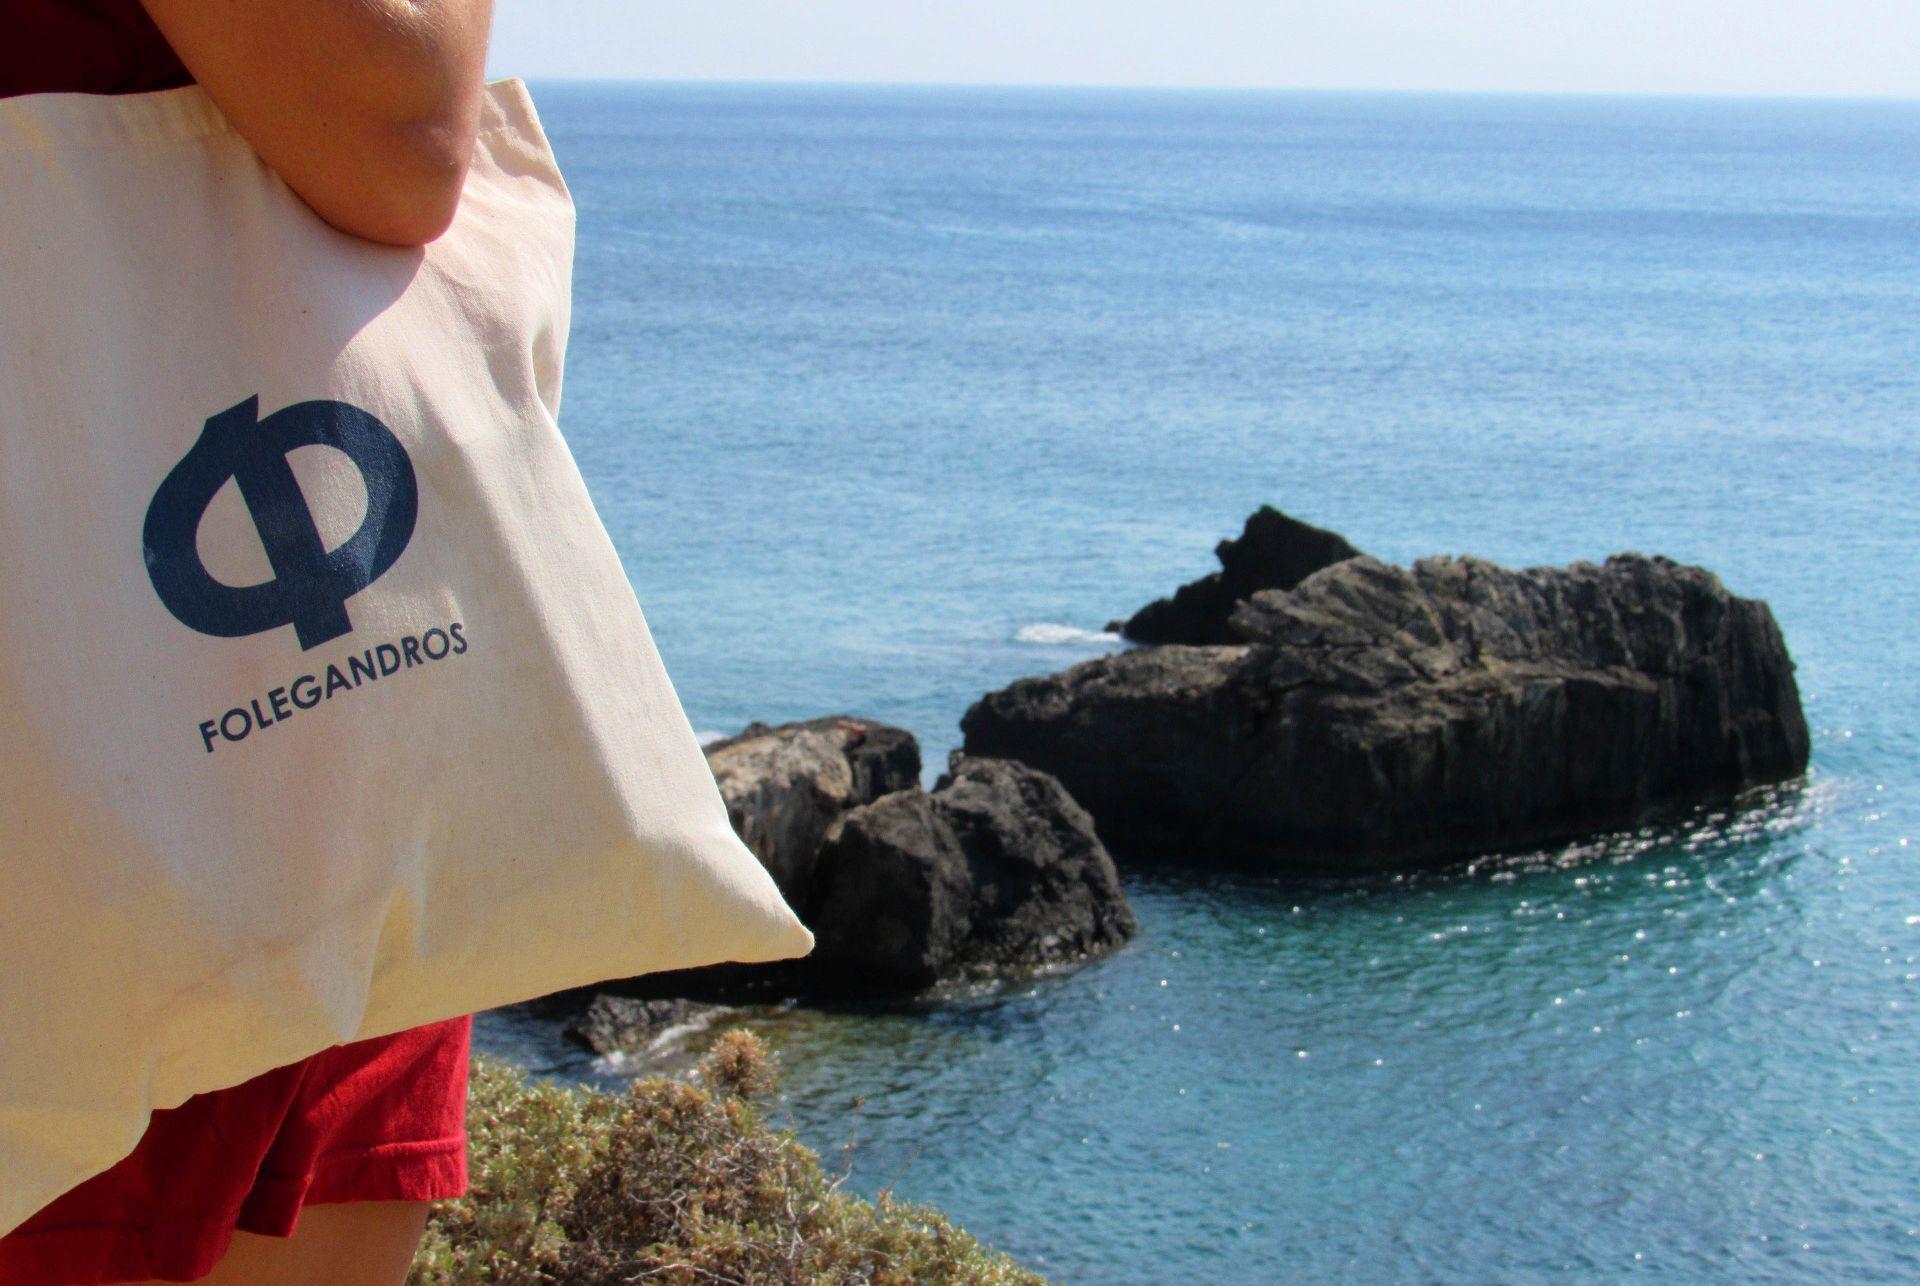 Shopping in Folegandros